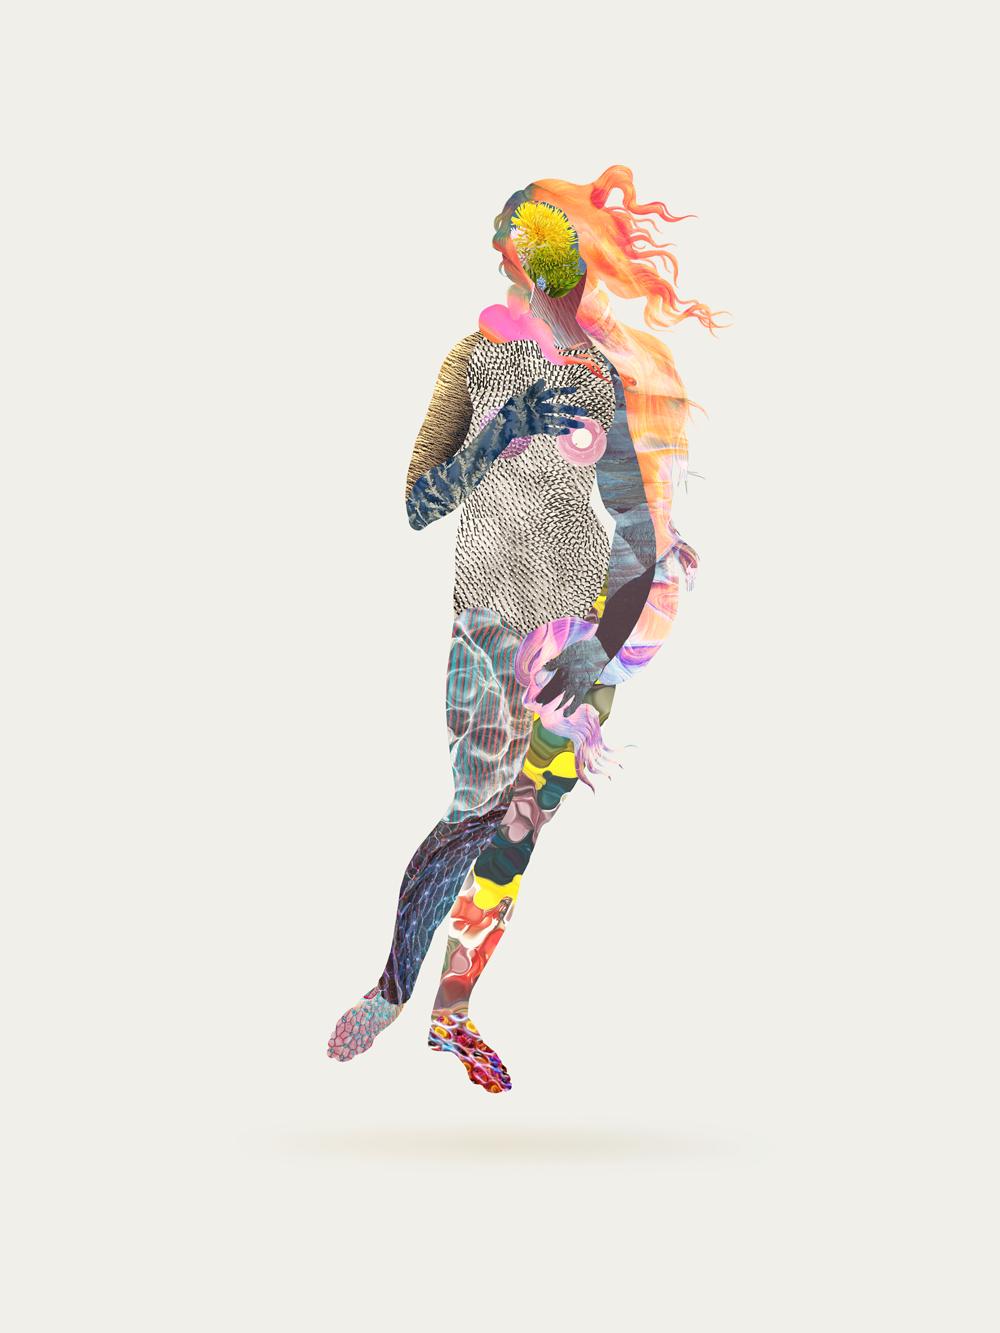 endless-rebirth-of-the-self-illustration